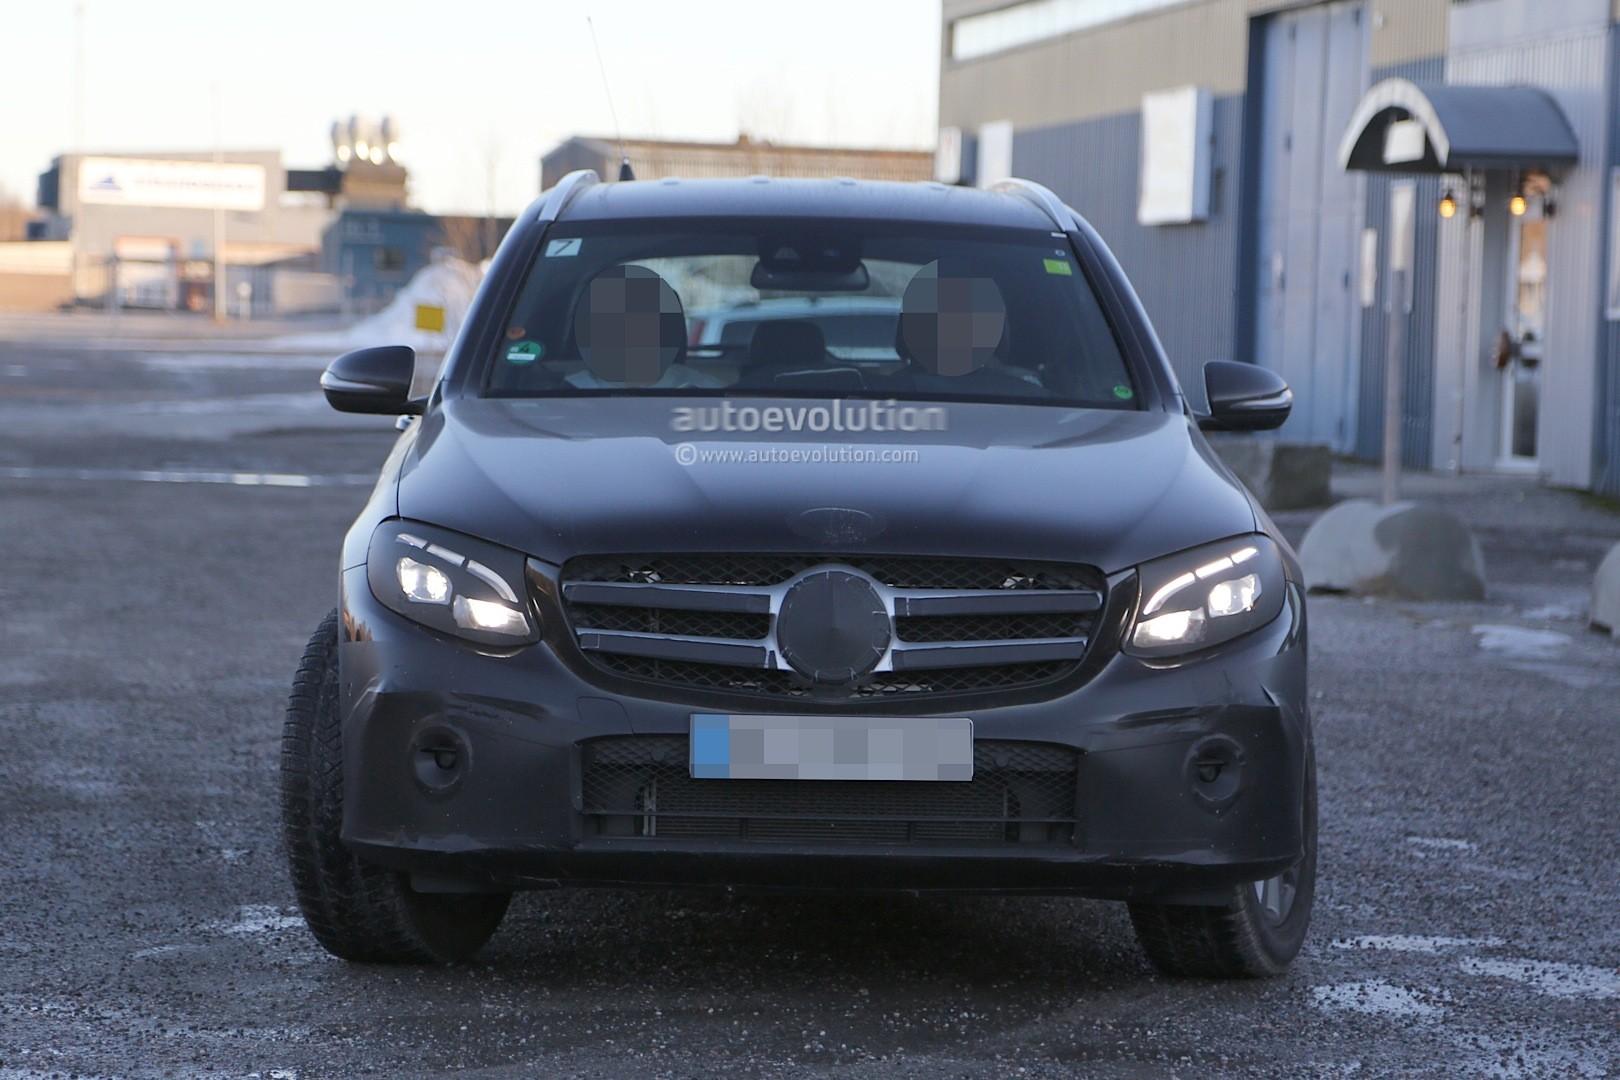 2015 - [Mercedes] GLC (GLK II) [X205] - Page 10 2016-mercedes-glc-spy-photos-show-nearly-undisguised-pre-production-prototypes_4